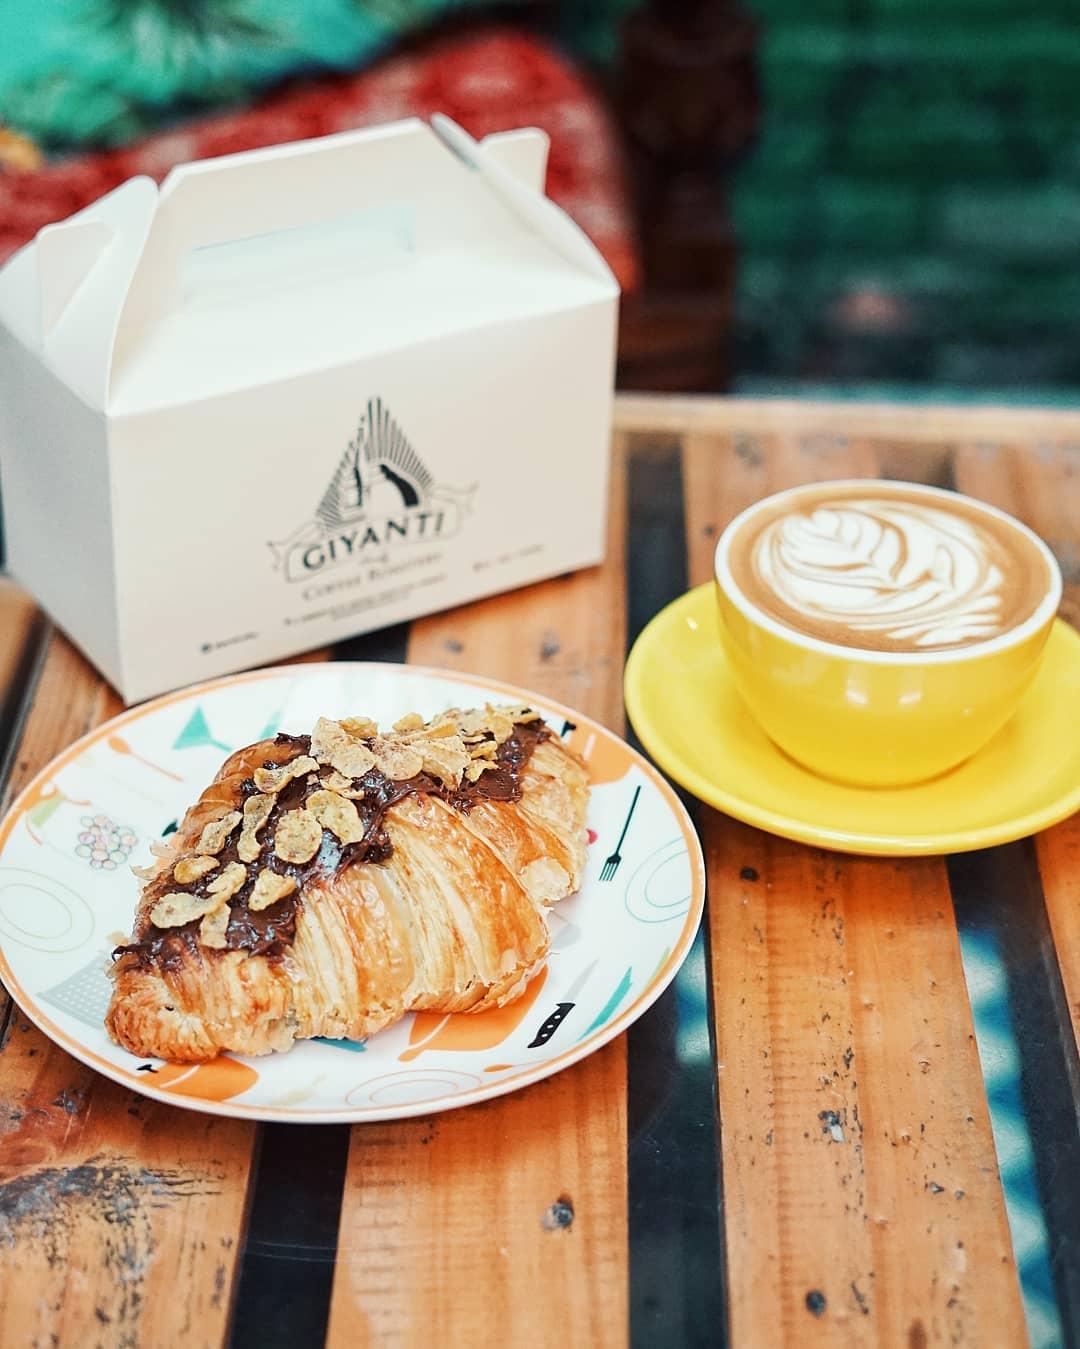 giyanti coffee roastery - hidden gem kafe jakarta